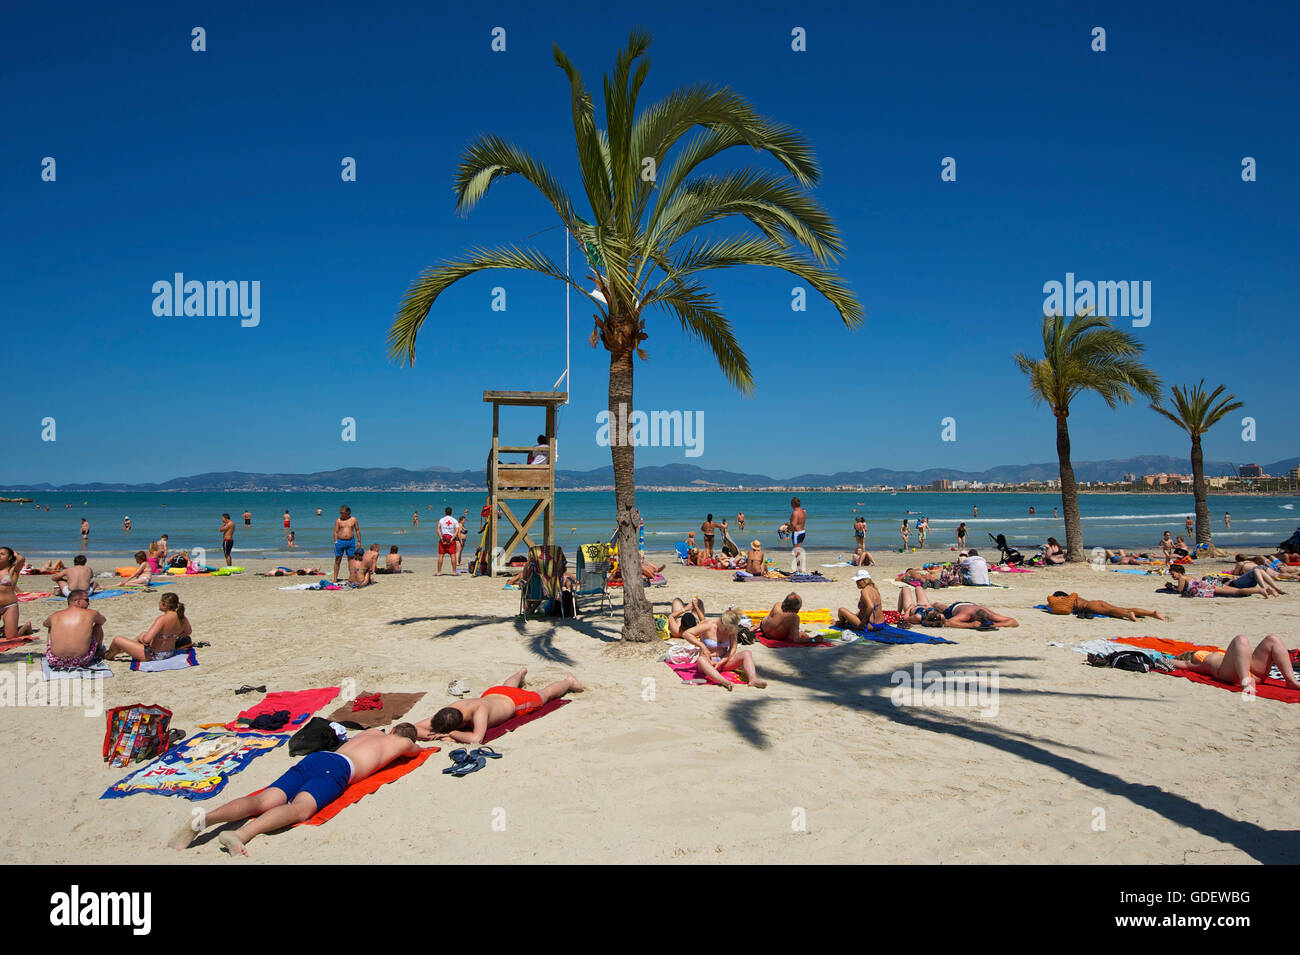 Playa de S'Arenal, Mallorca, Balearen, Spanien / El Arenal Stockfoto